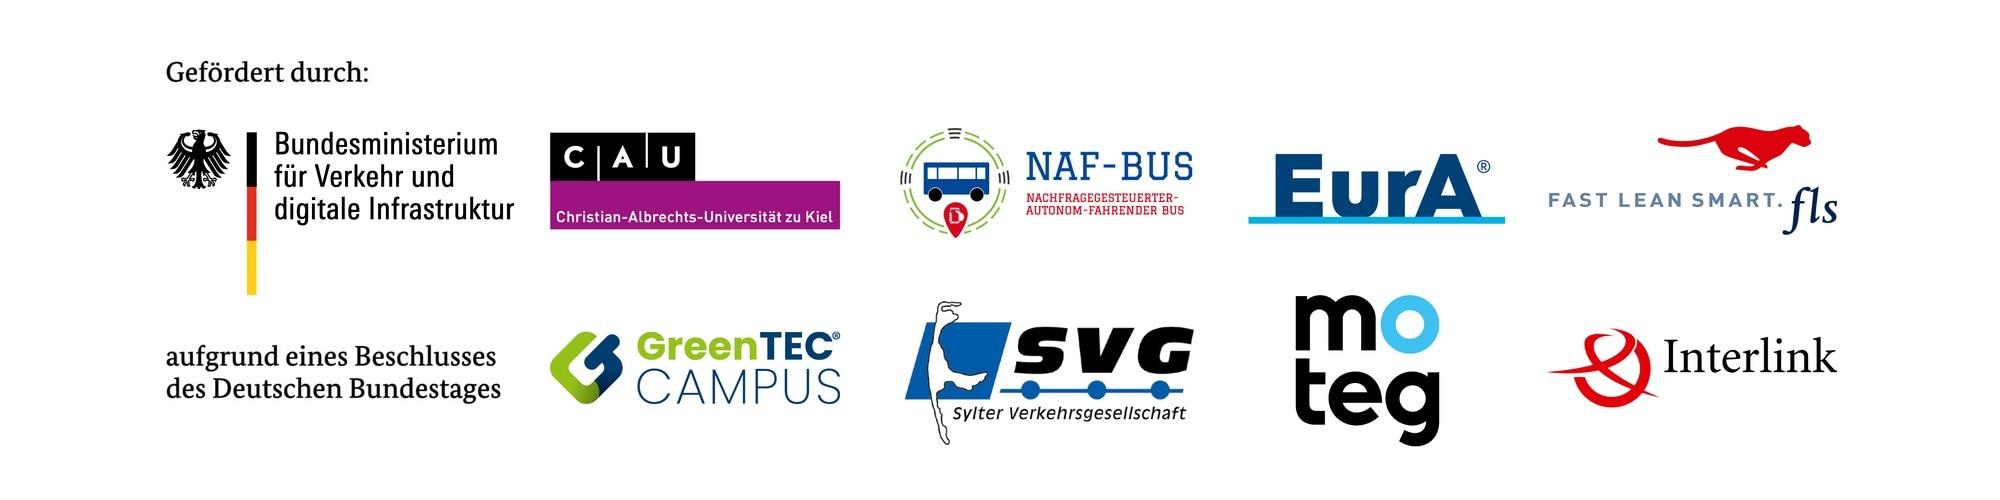 Logos von NAF-Bus Projektpartnern